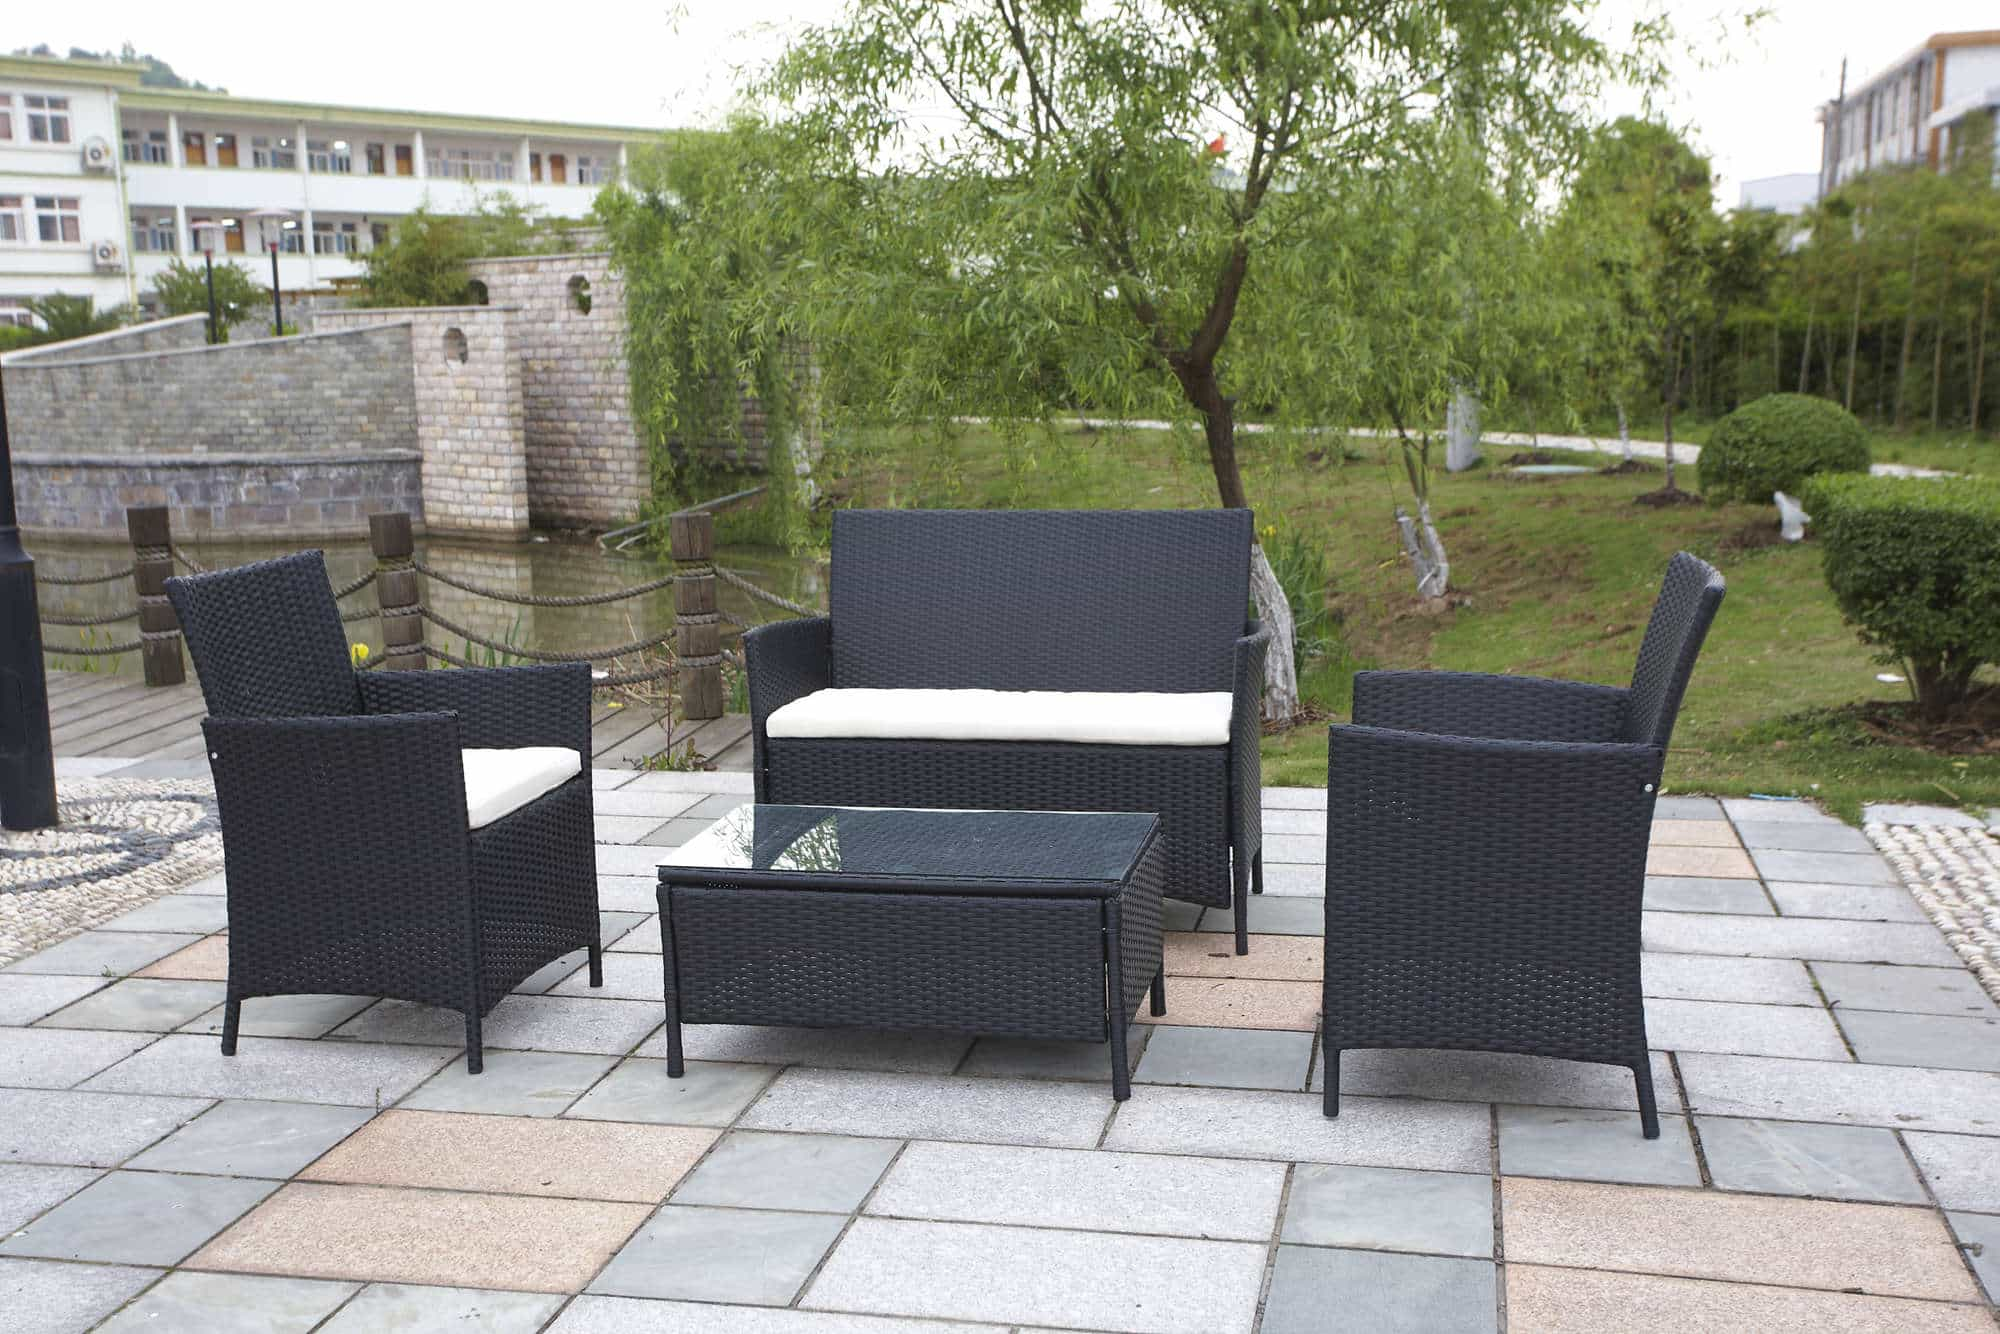 4 seater ruby sofa range garden furniture ireland for Outdoor furniture ireland